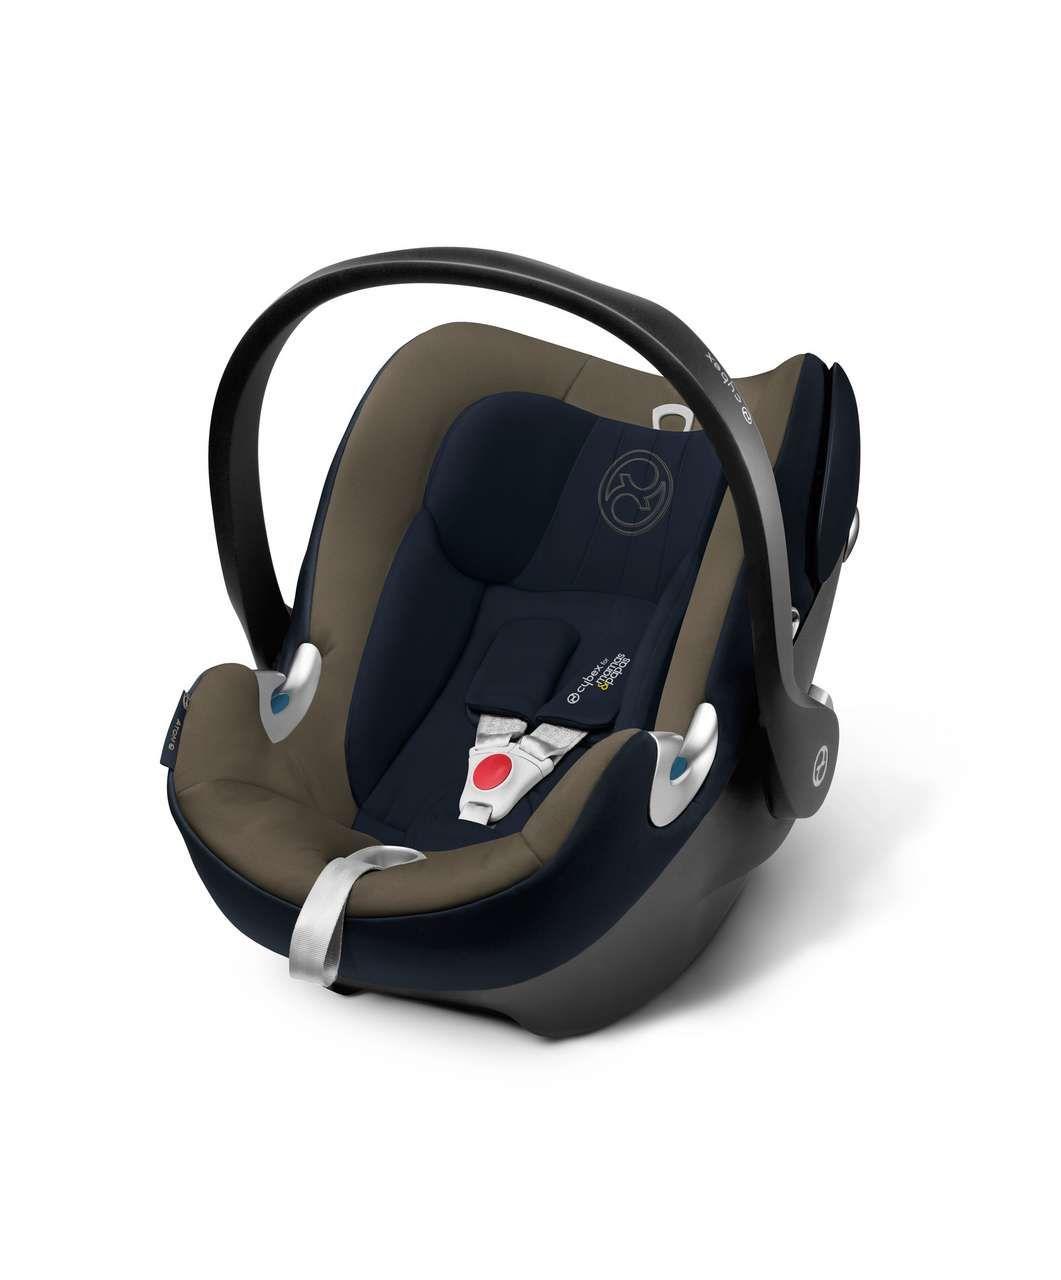 Cybex Aton Q Car Seat - Navy - Birth - 13kg/18 Months - Mamas